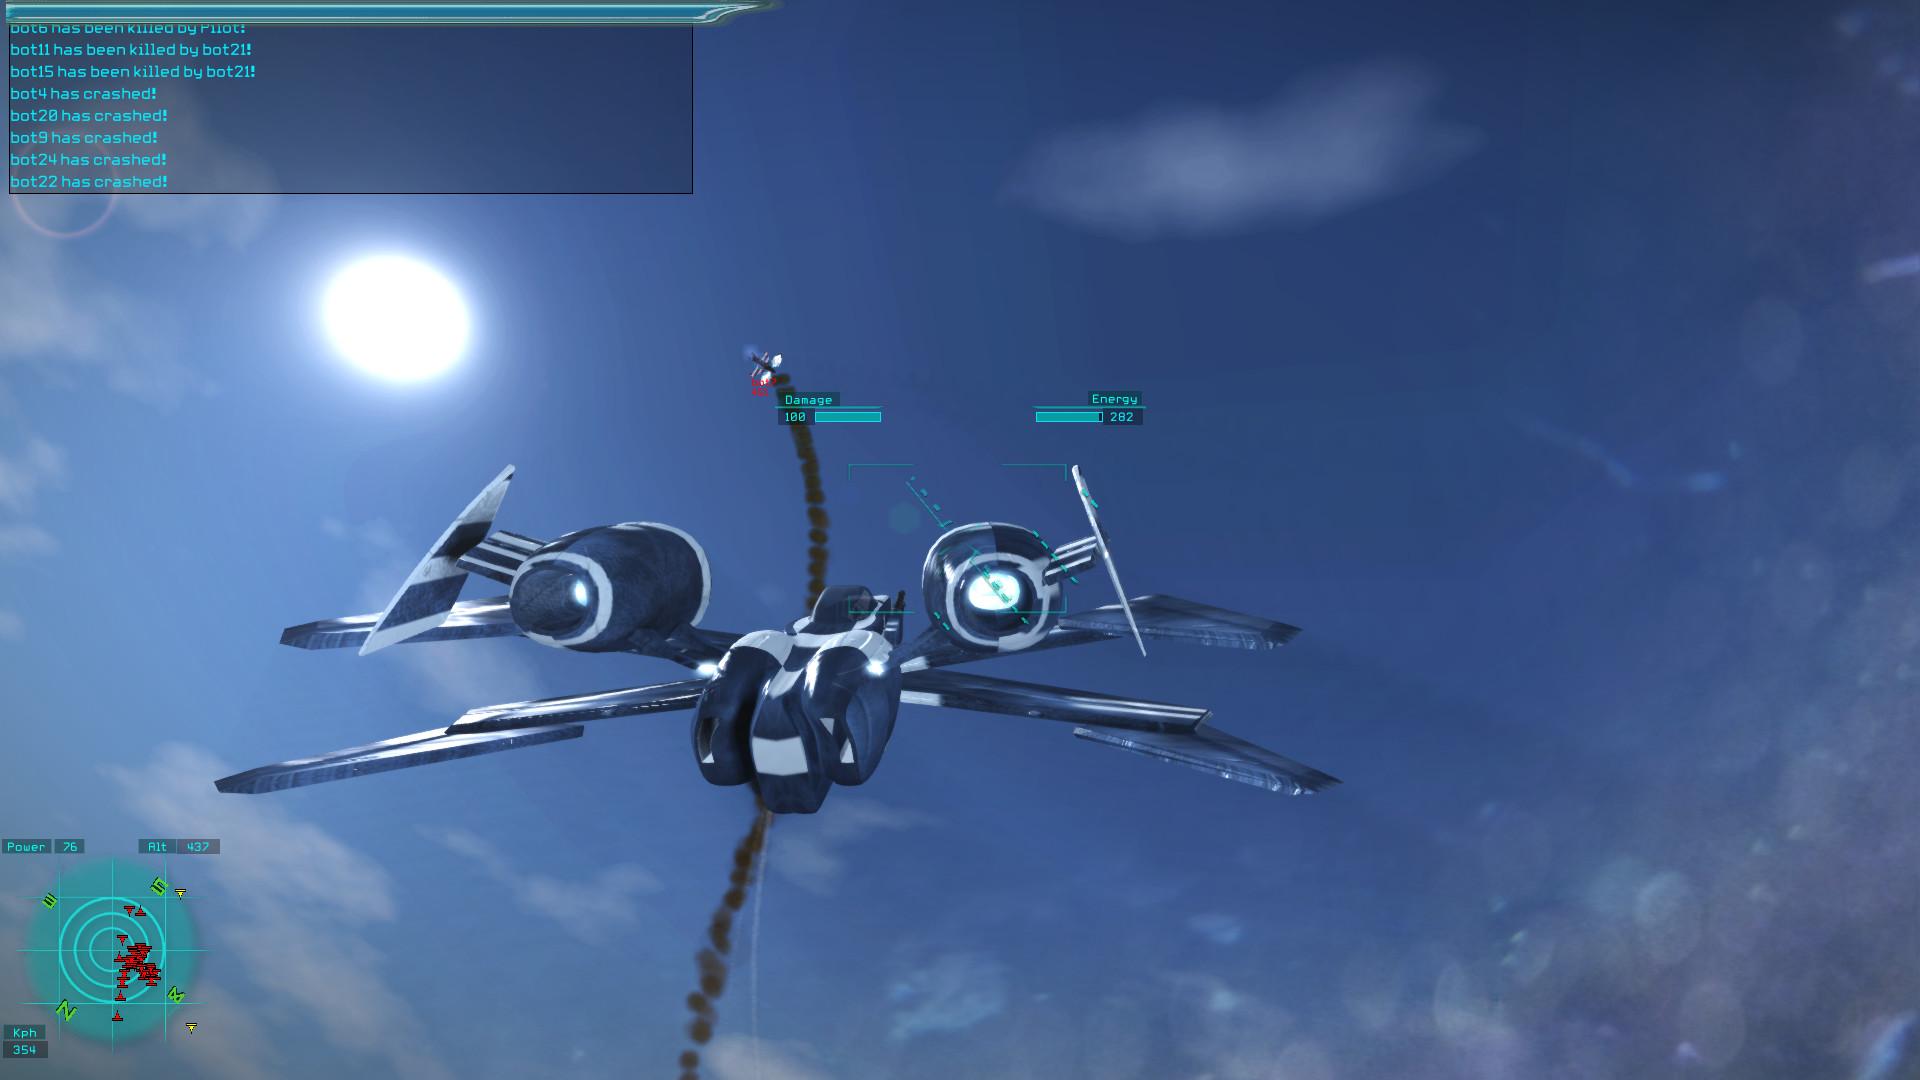 AX-EL - Air XenoDawn Review Screenshot 2